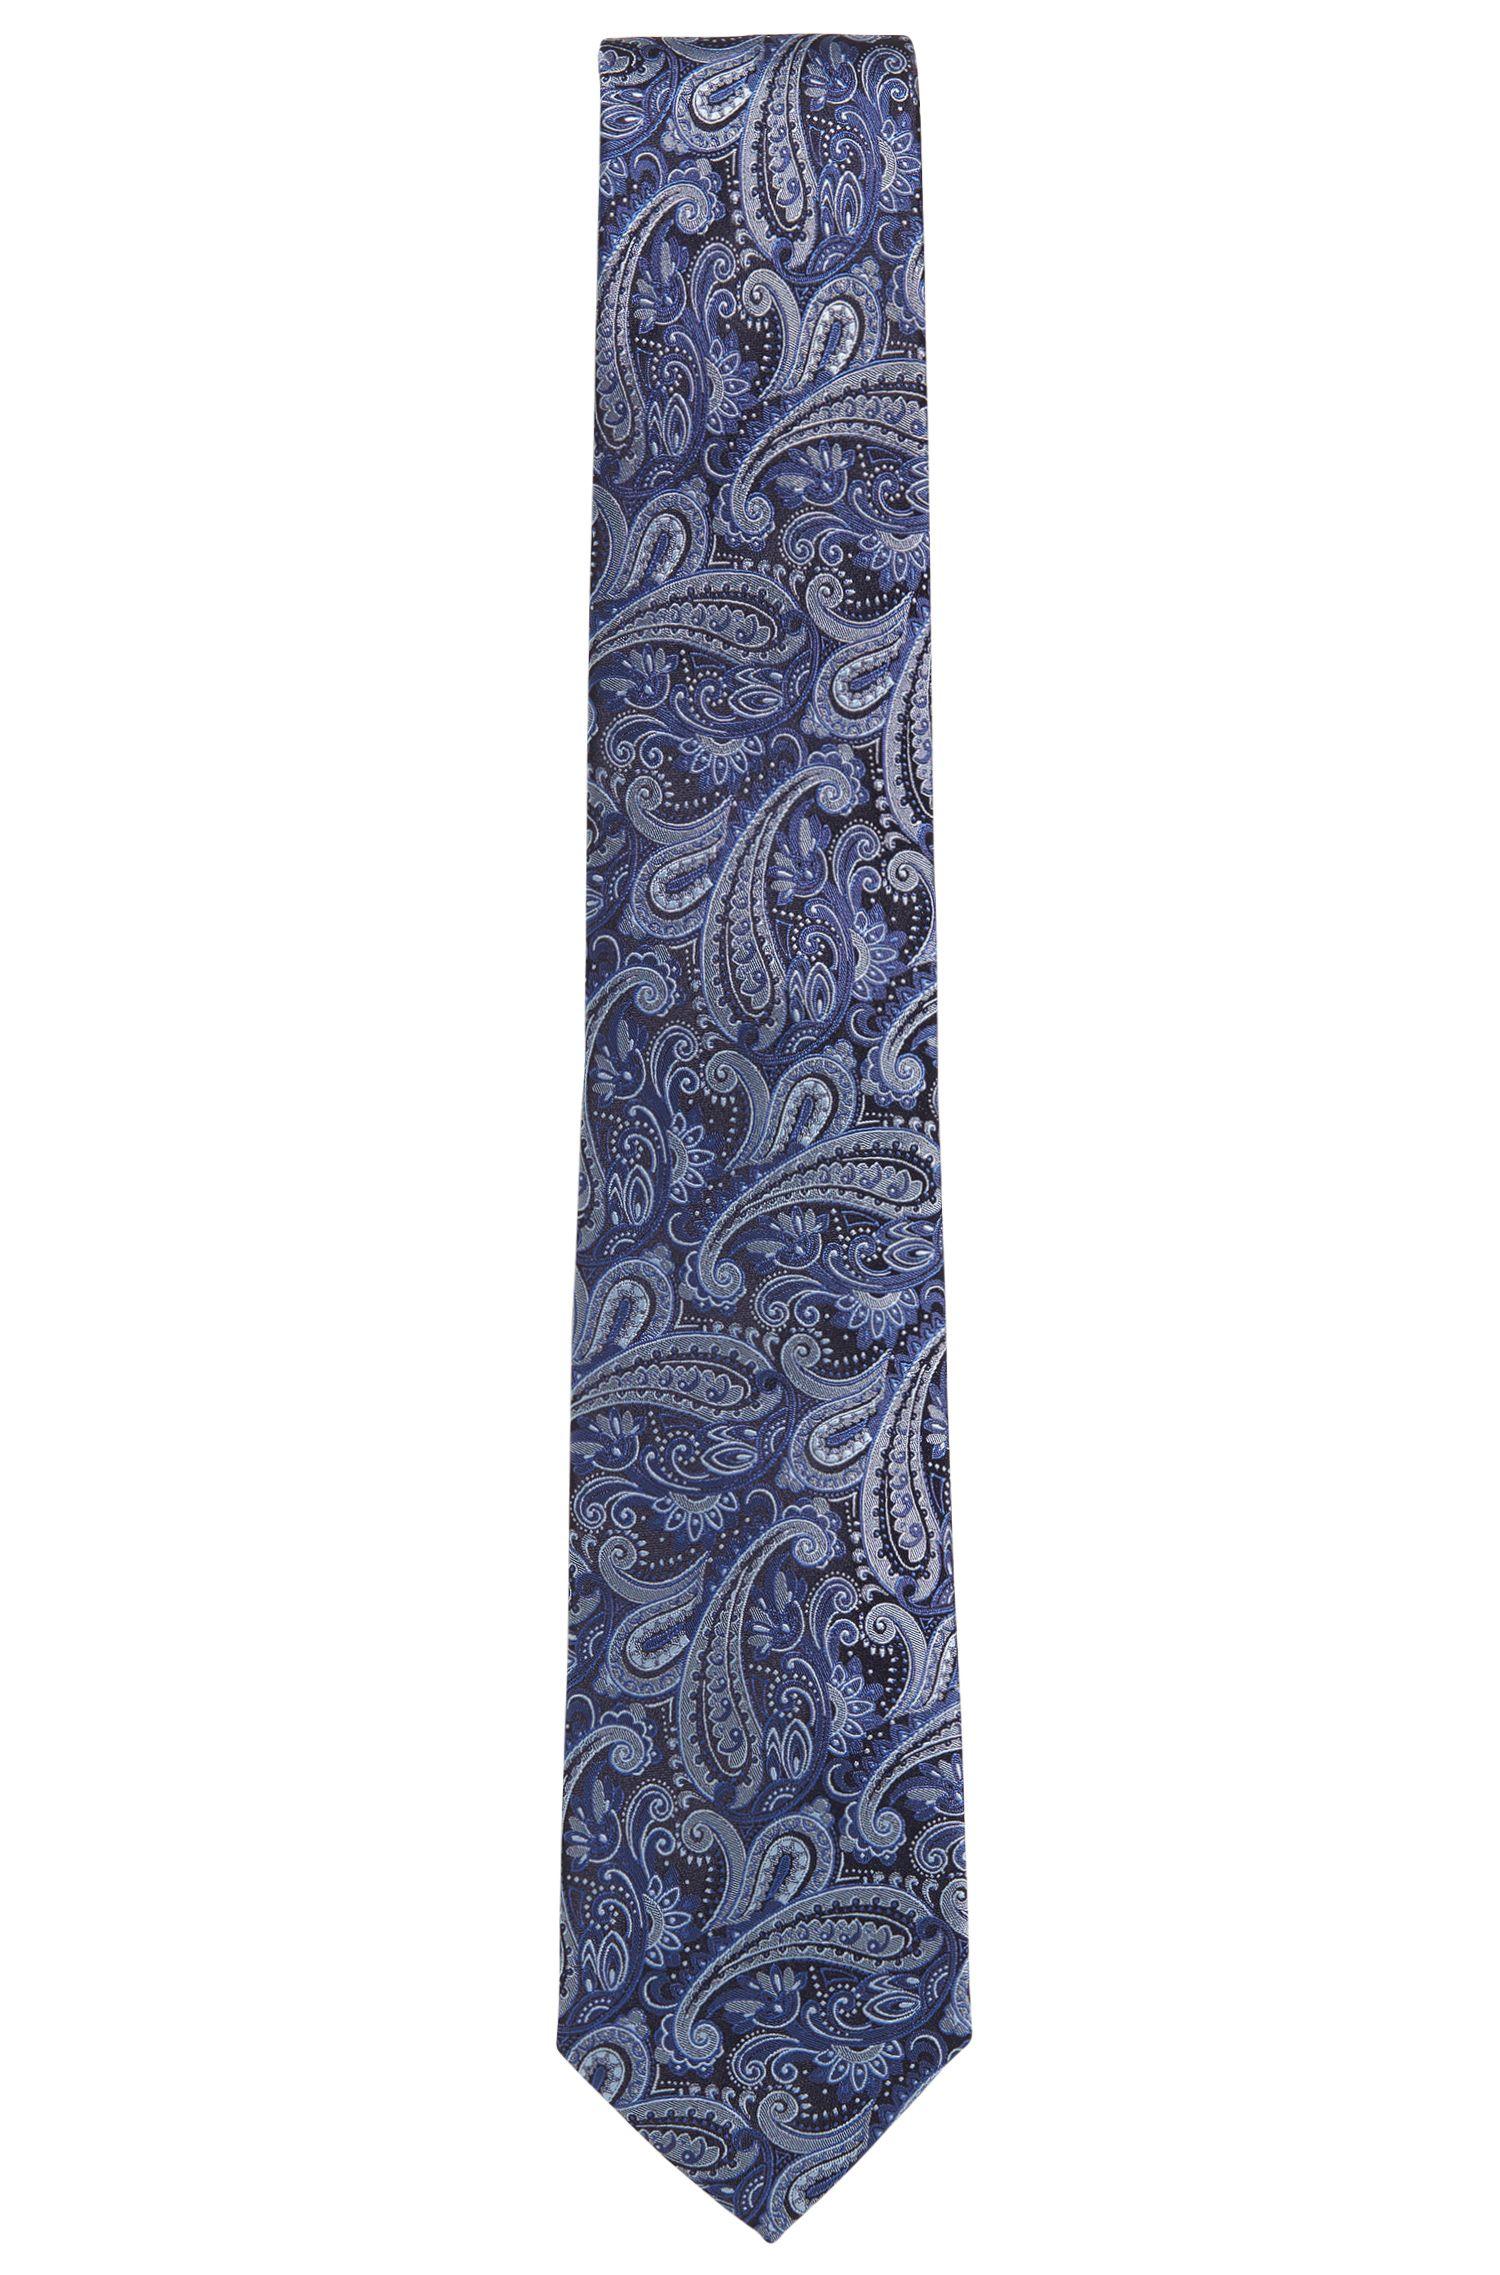 'Tie 7.5 cm' | Regular, Paisley Silk Tie